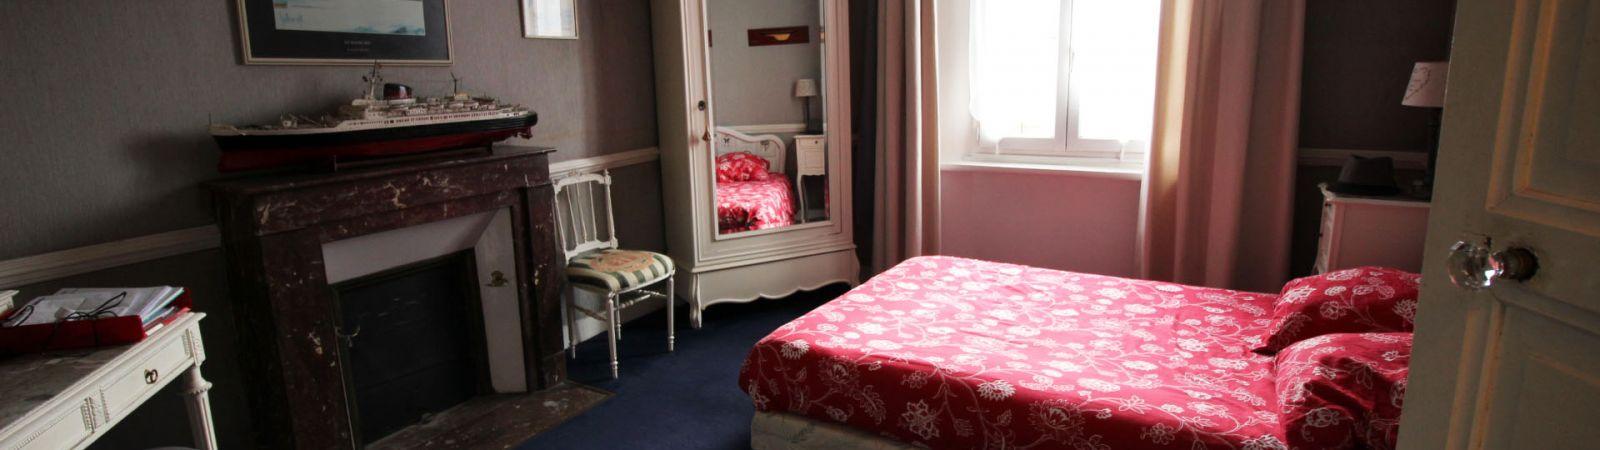 photo 7: Somptueuse demeure du XIXème siècle